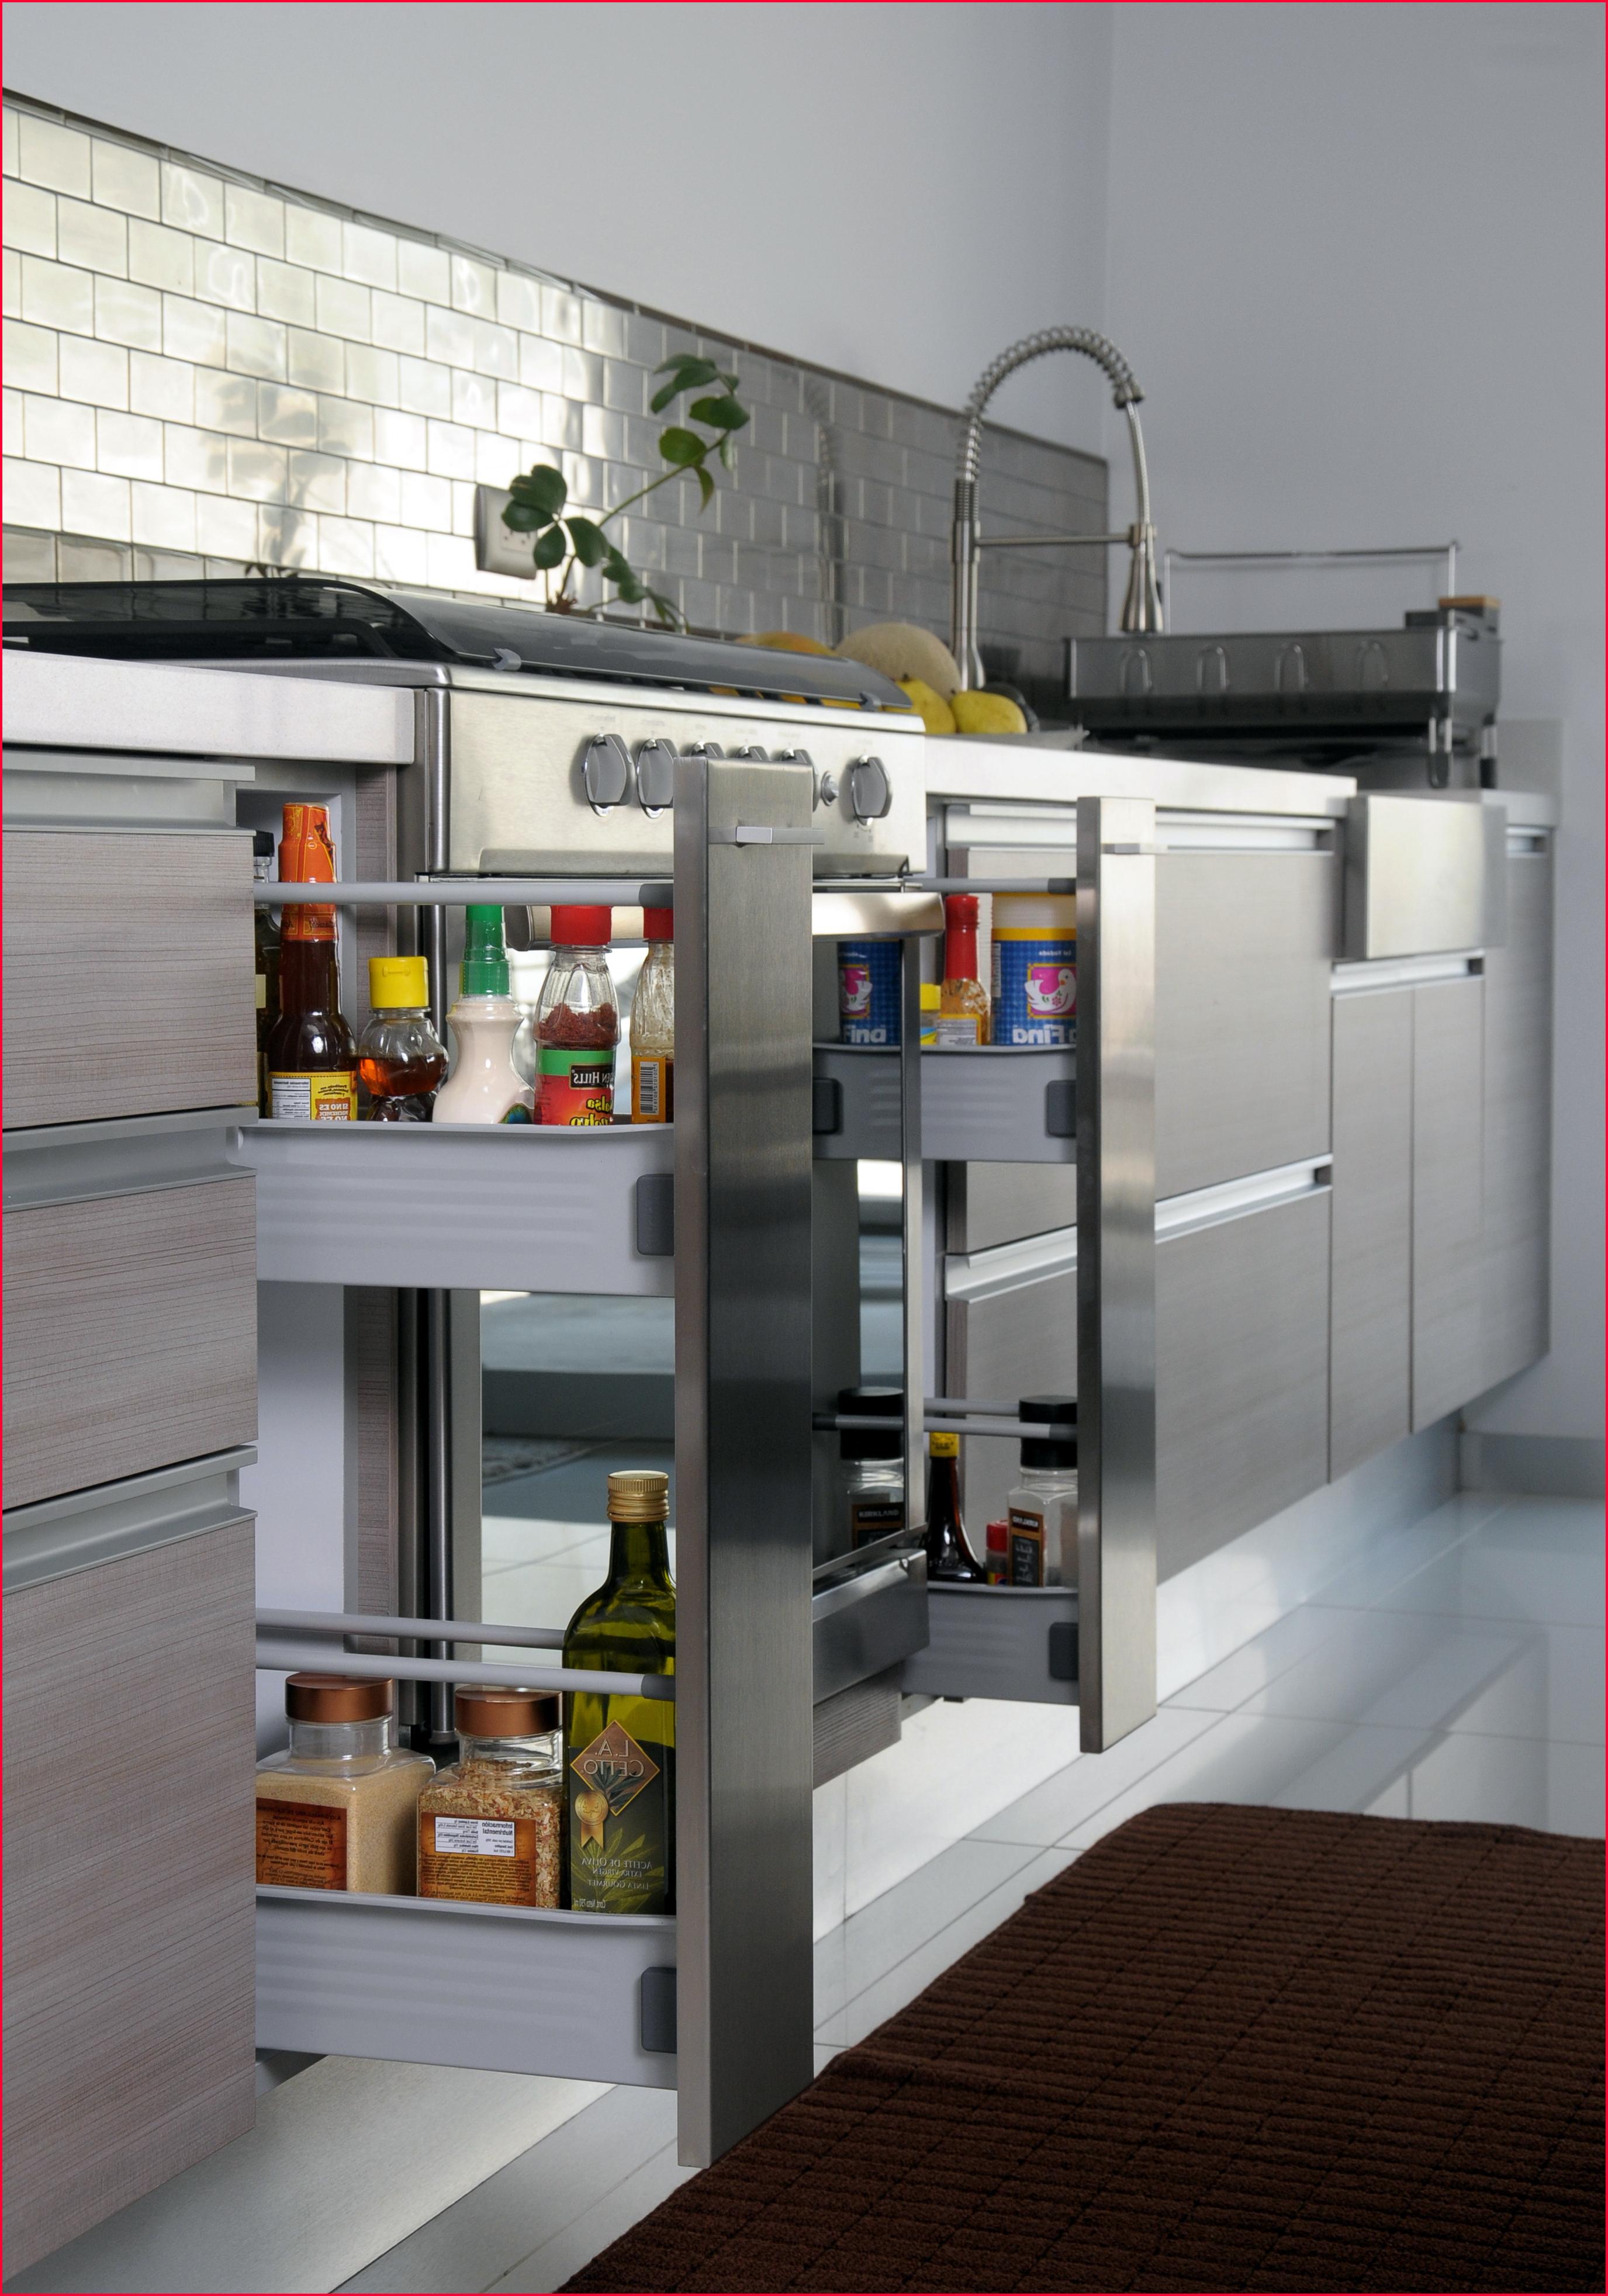 Muebles Para Espacios Pequeños X8d1 Muebles Pequeà Os Cocinas En Peque Os Espacios Con Cinco Tips